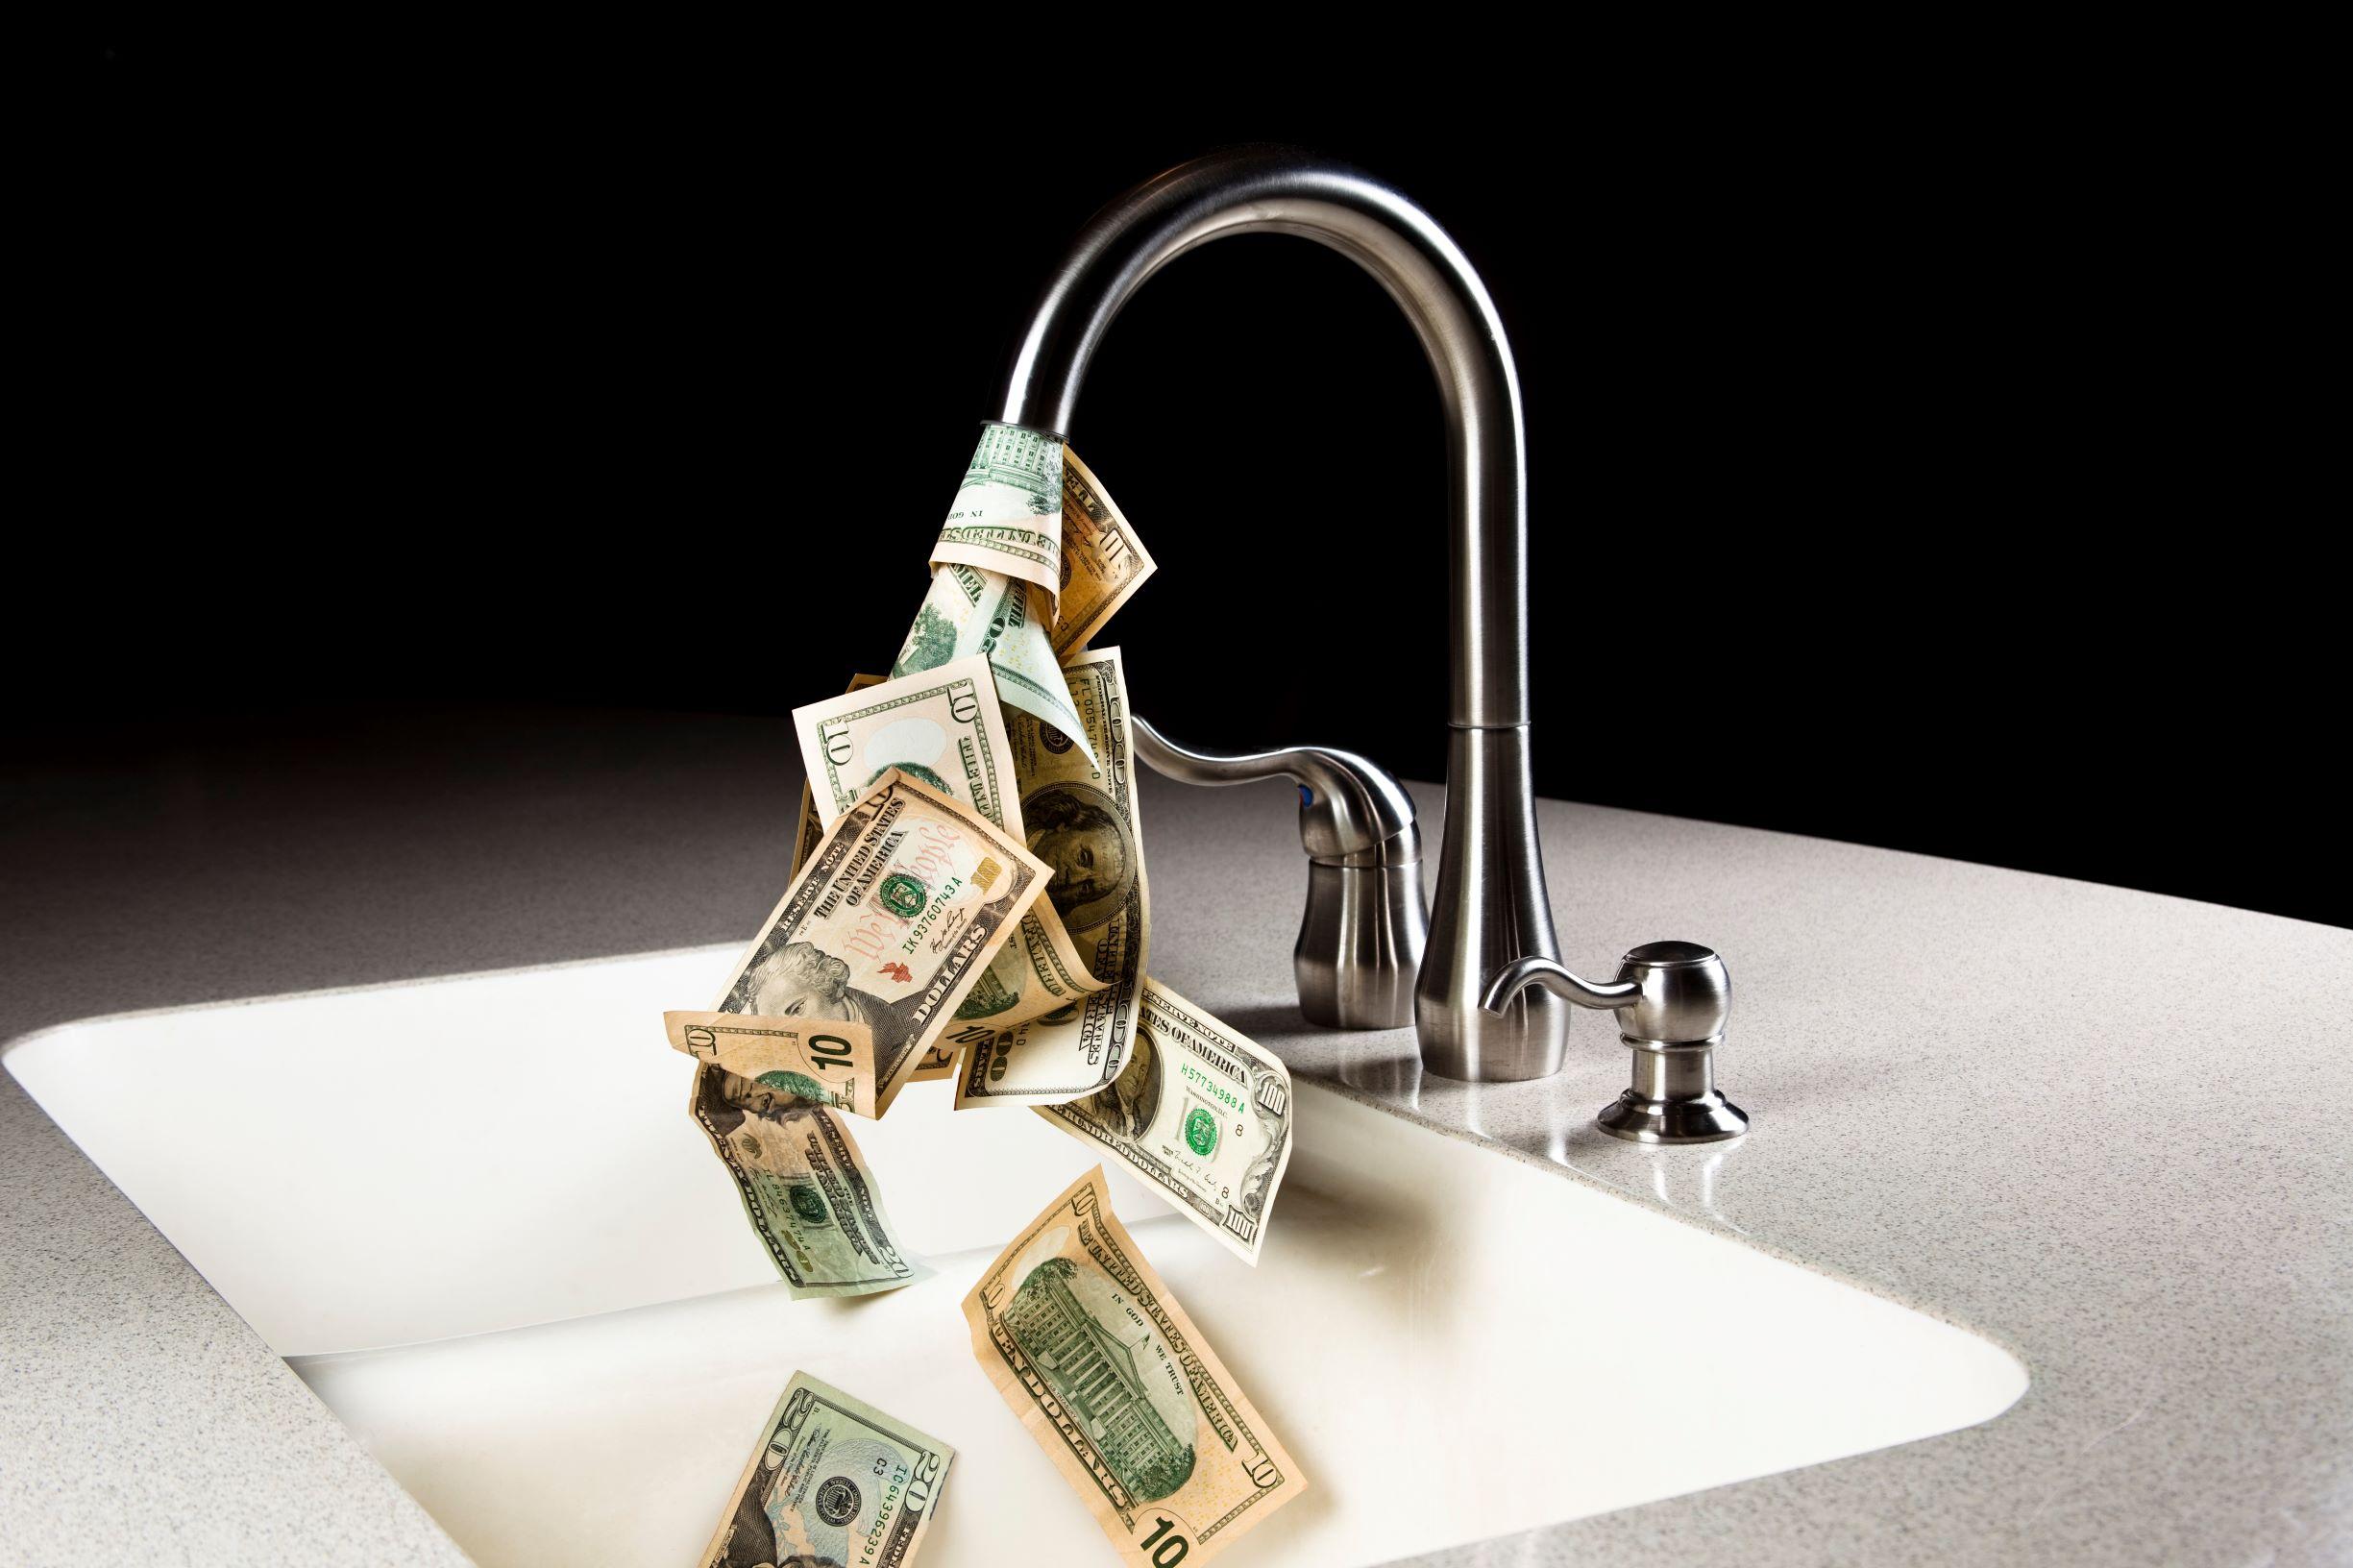 Spending money on water